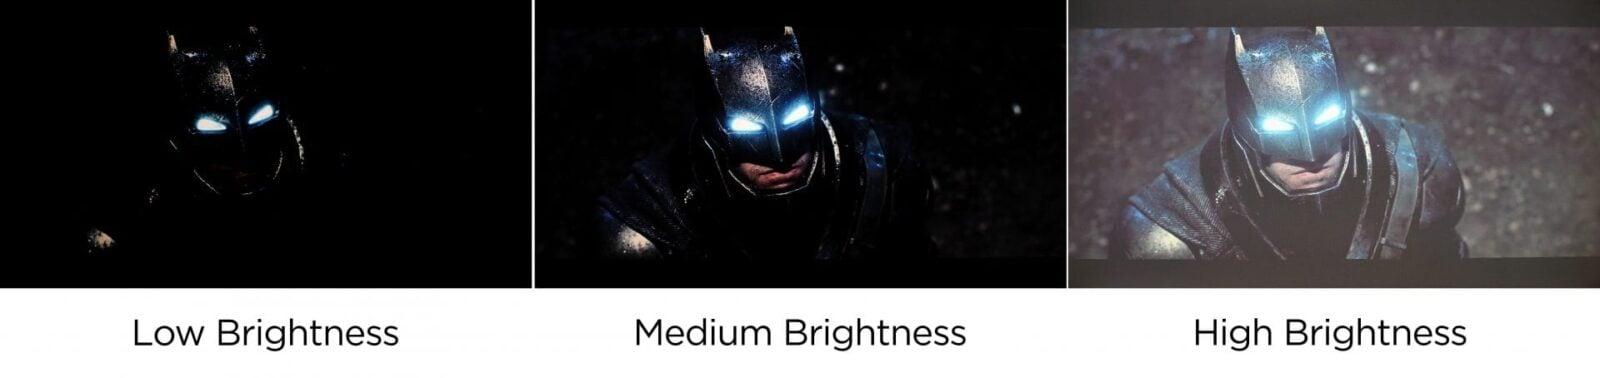 brightness best tv picture settings